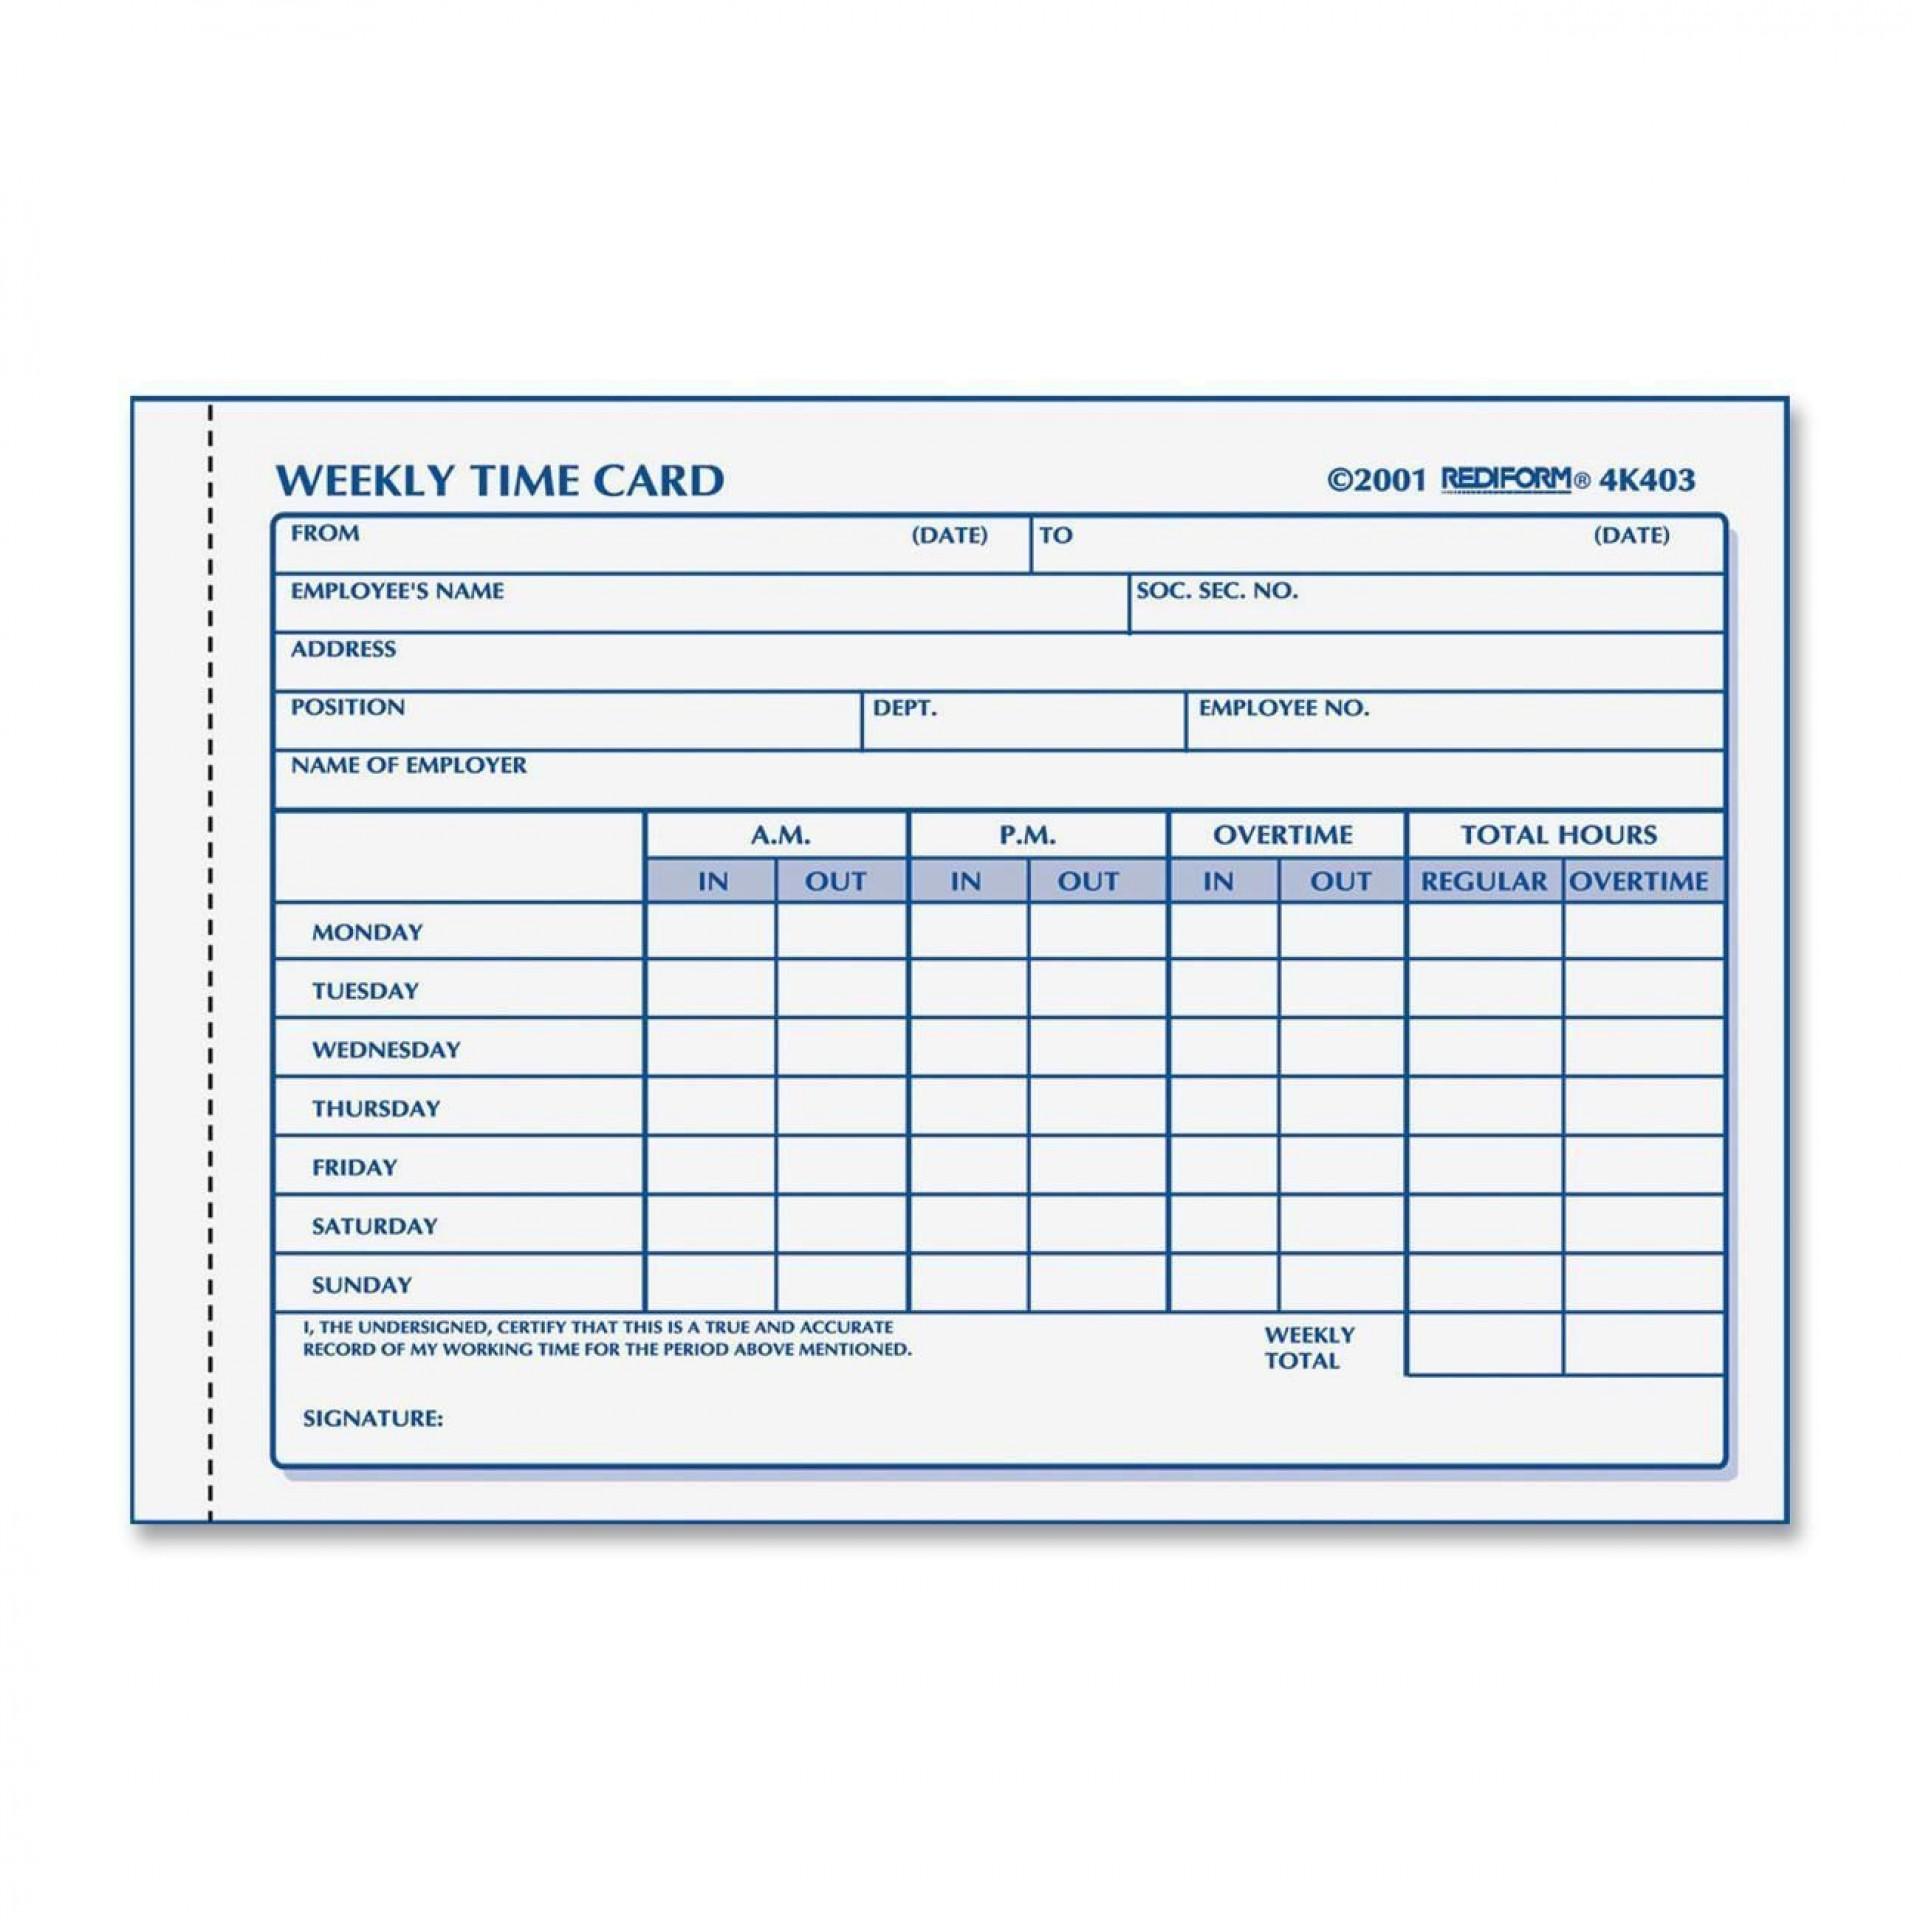 000 Astounding Employee Time Card Form Inspiration  Timesheet Template Excel Sheet Free1920